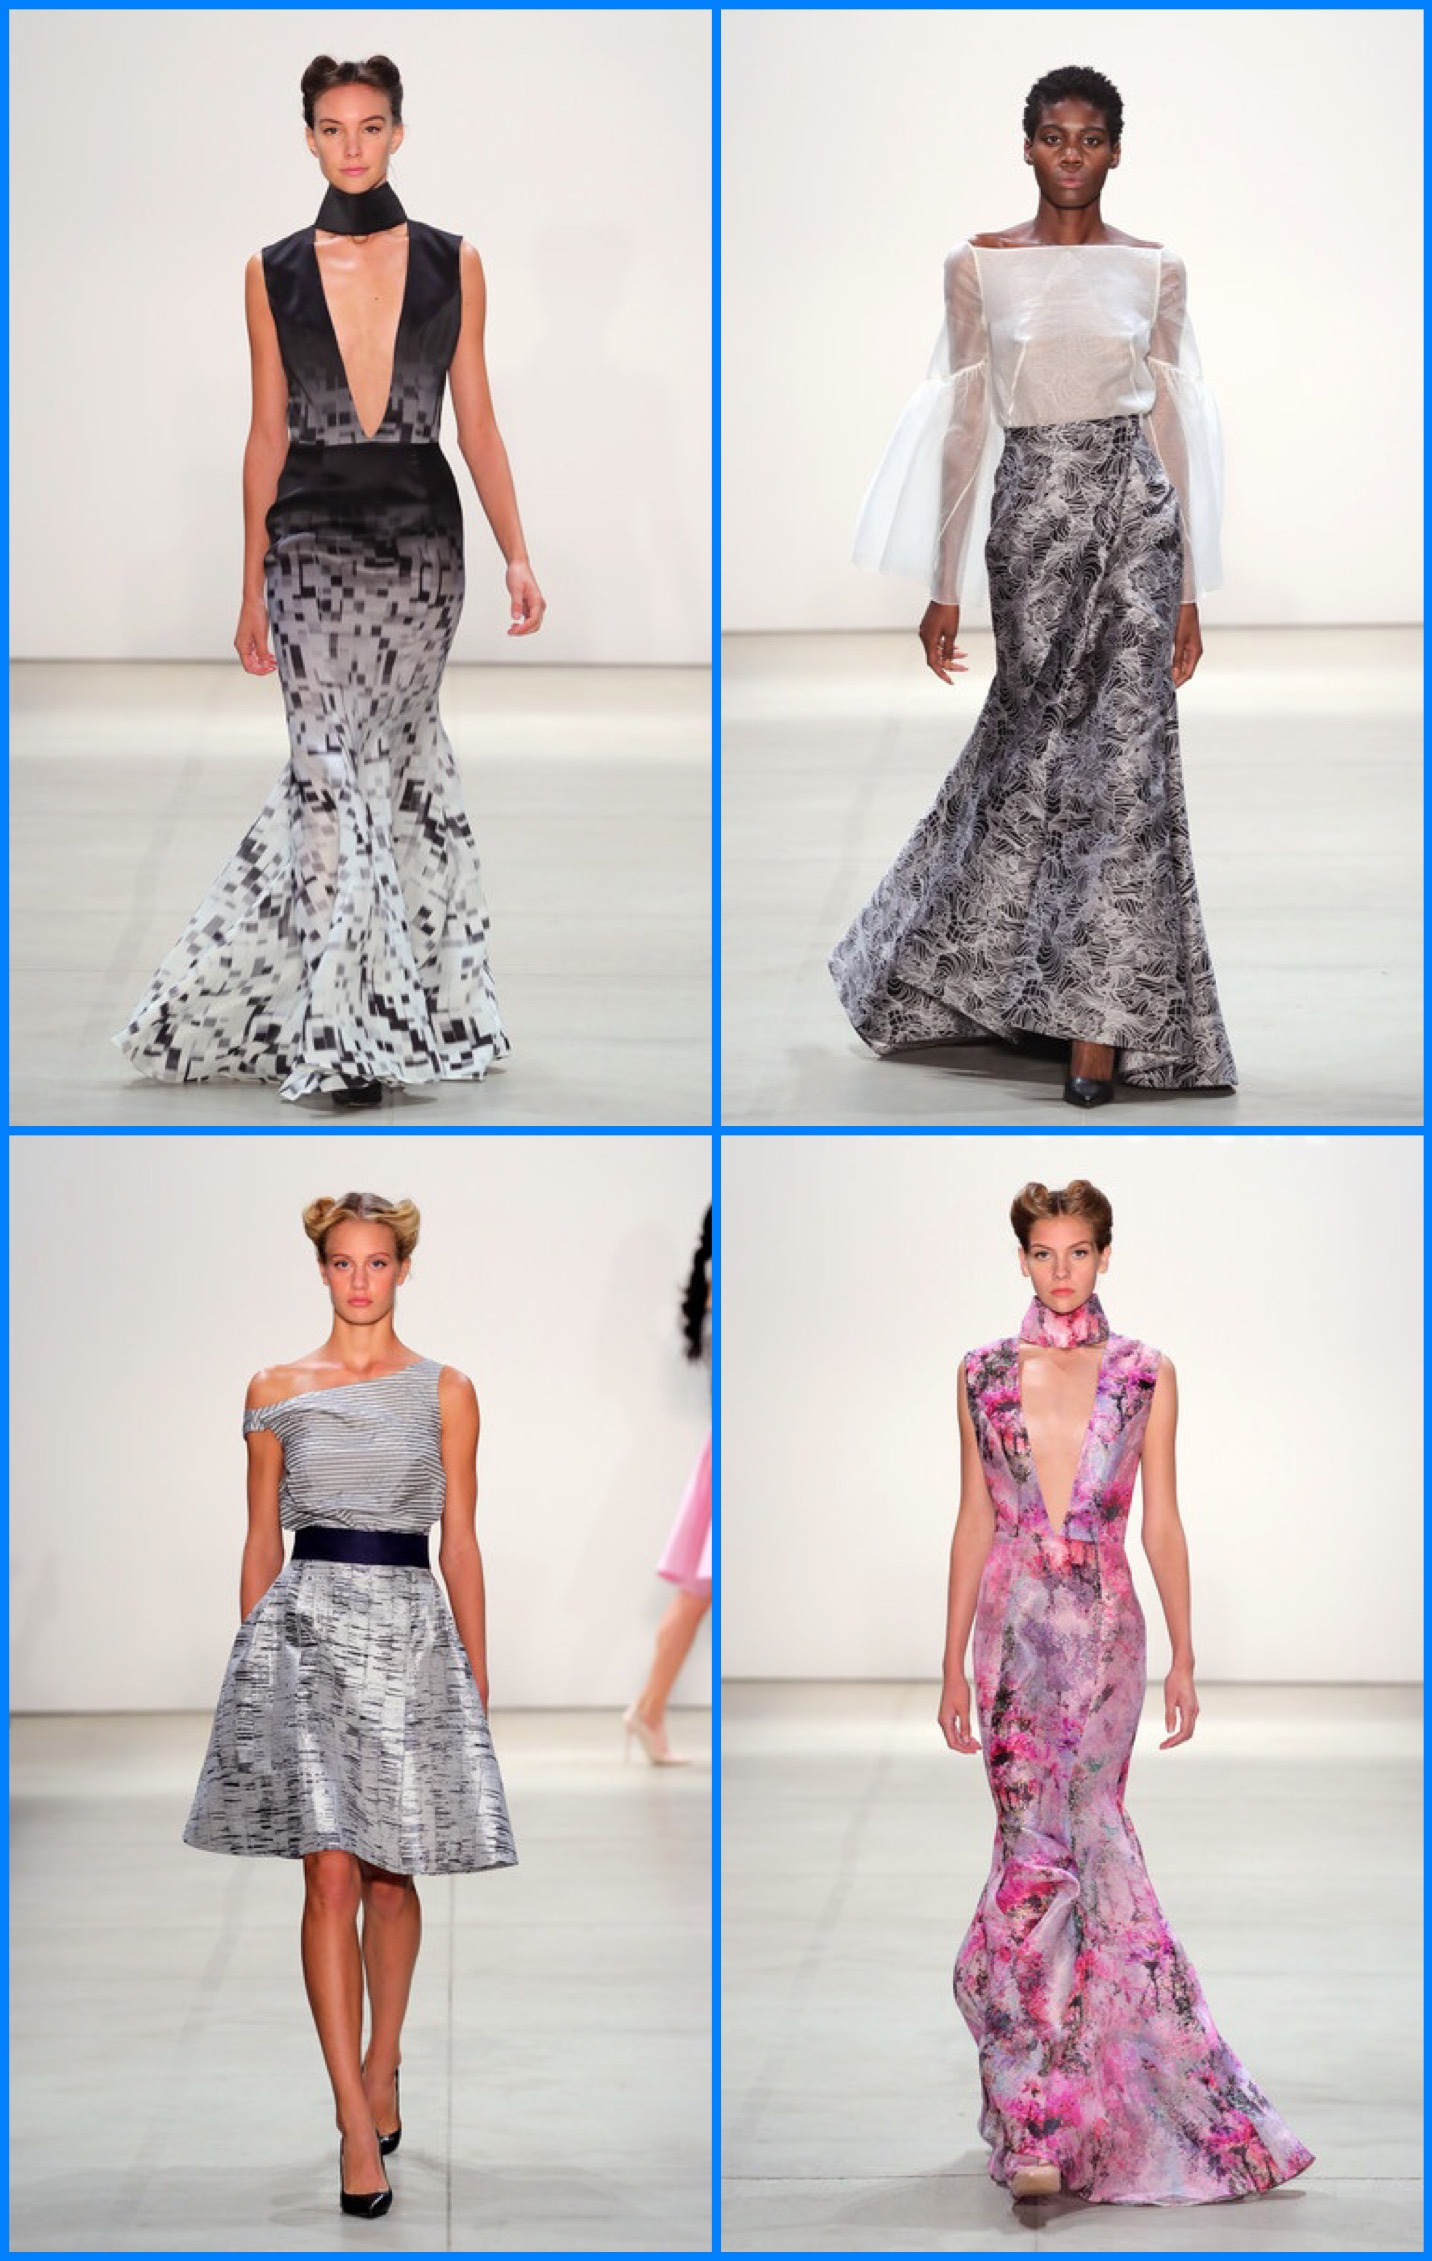 new-york-fashion-week-pret-a-porter-spring-summer-2017-style-irina-vitjaz